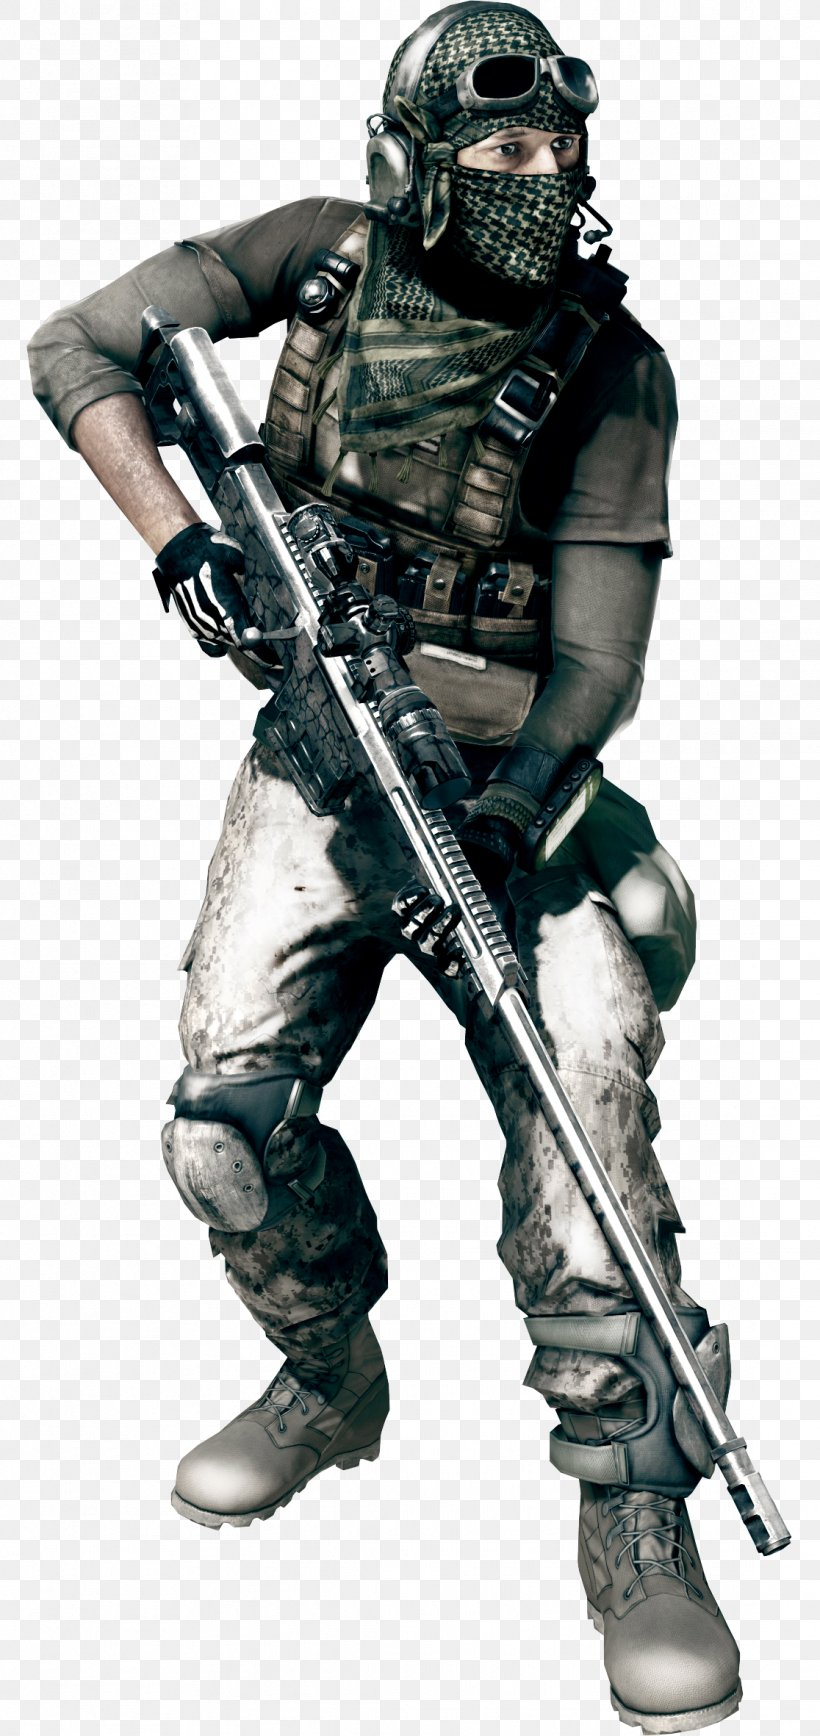 Battlefield 3 Battlefield 2 Battlefield Heroes Battlefield: Bad Company 2 Battlefield 4, PNG, 1116x2363px, Battlefield 3, Armour, Battlefield, Battlefield 2, Battlefield 4 Download Free